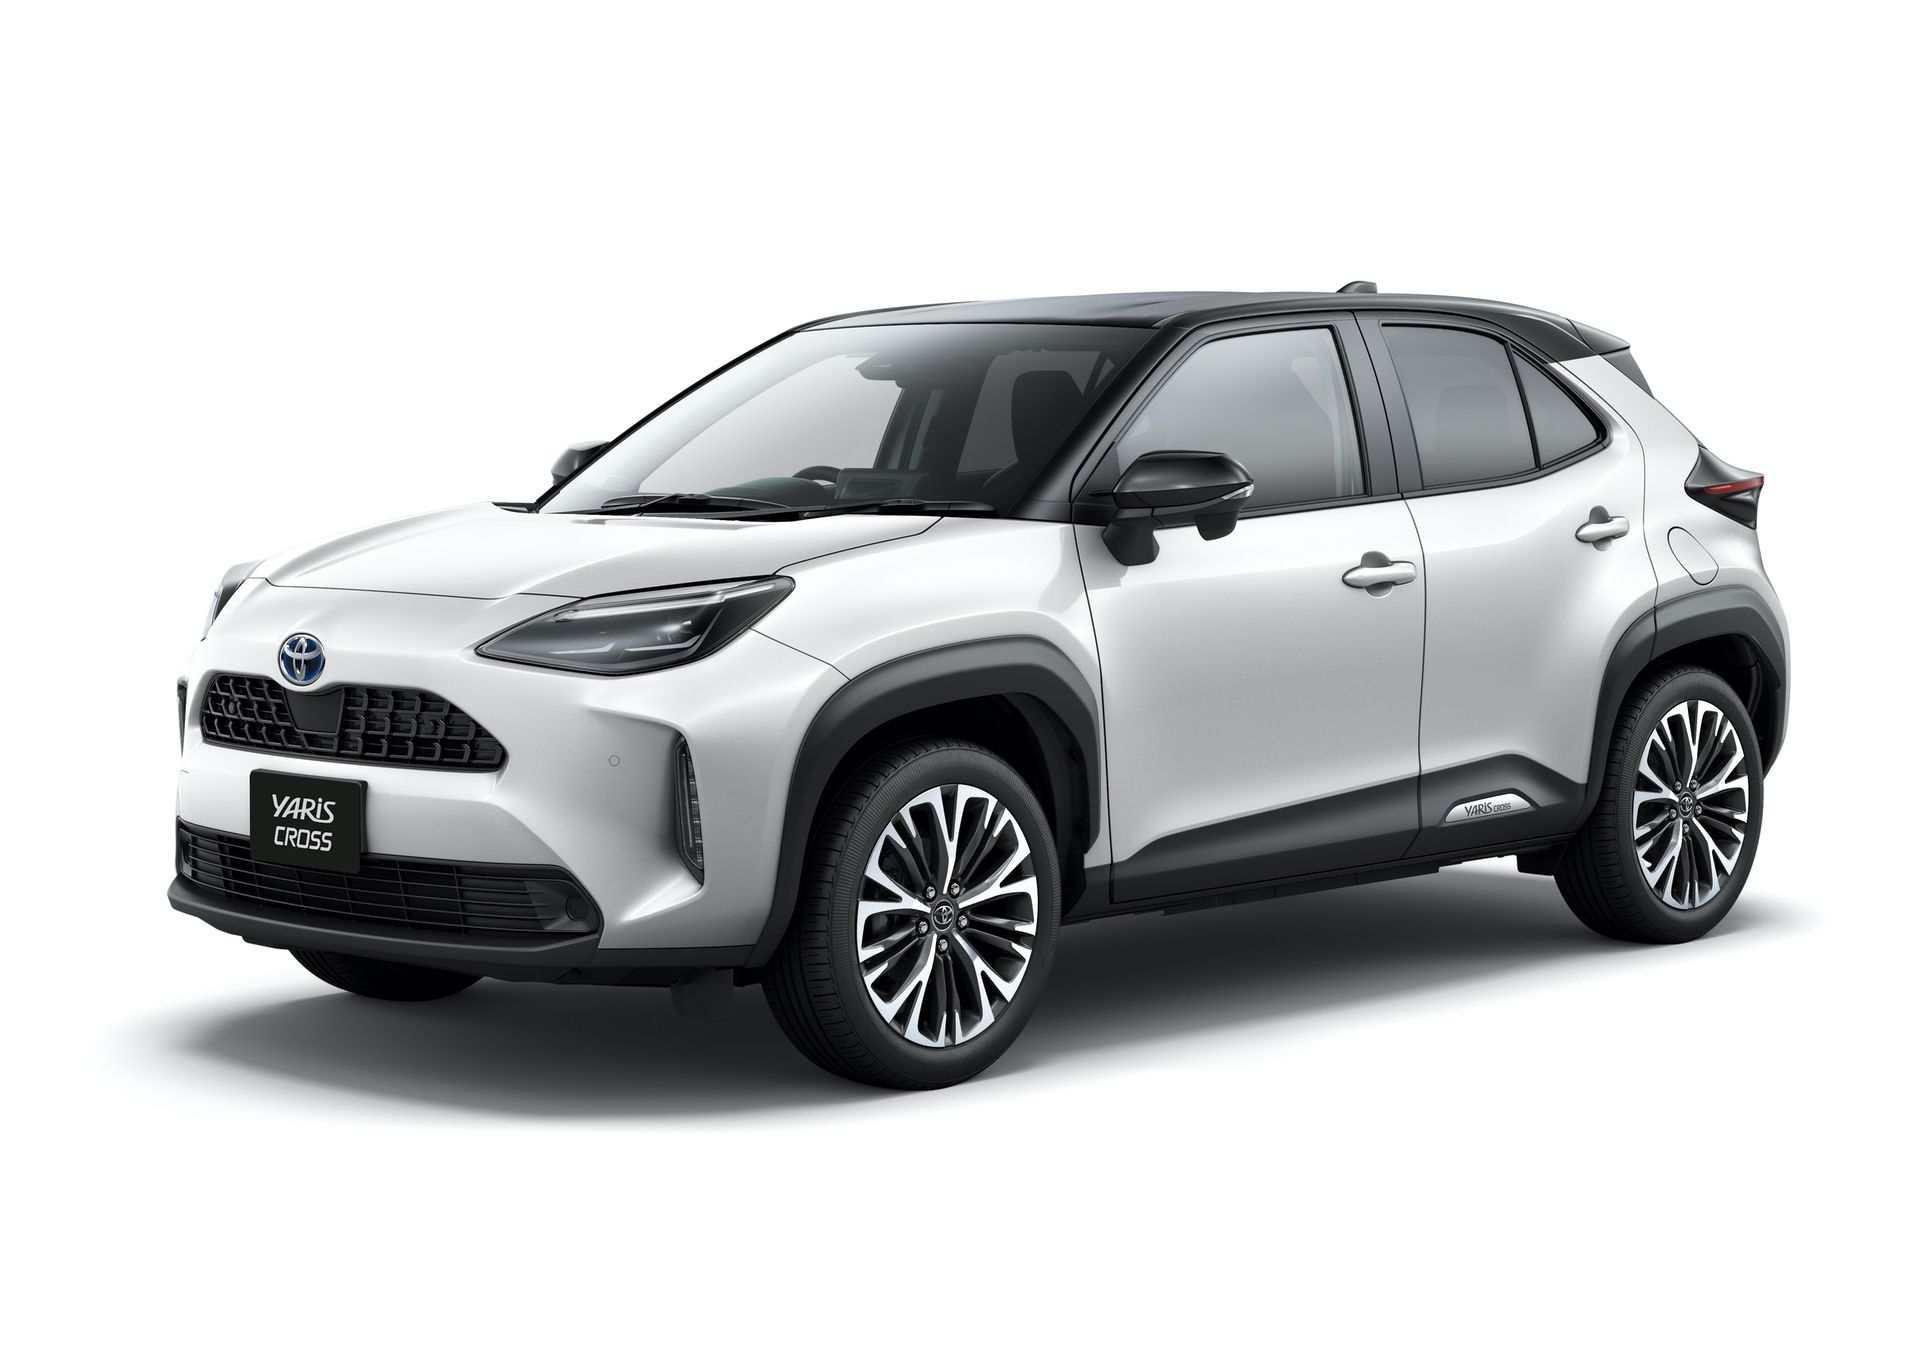 2020_Toyota_Yaris_Cross_JDM_0000